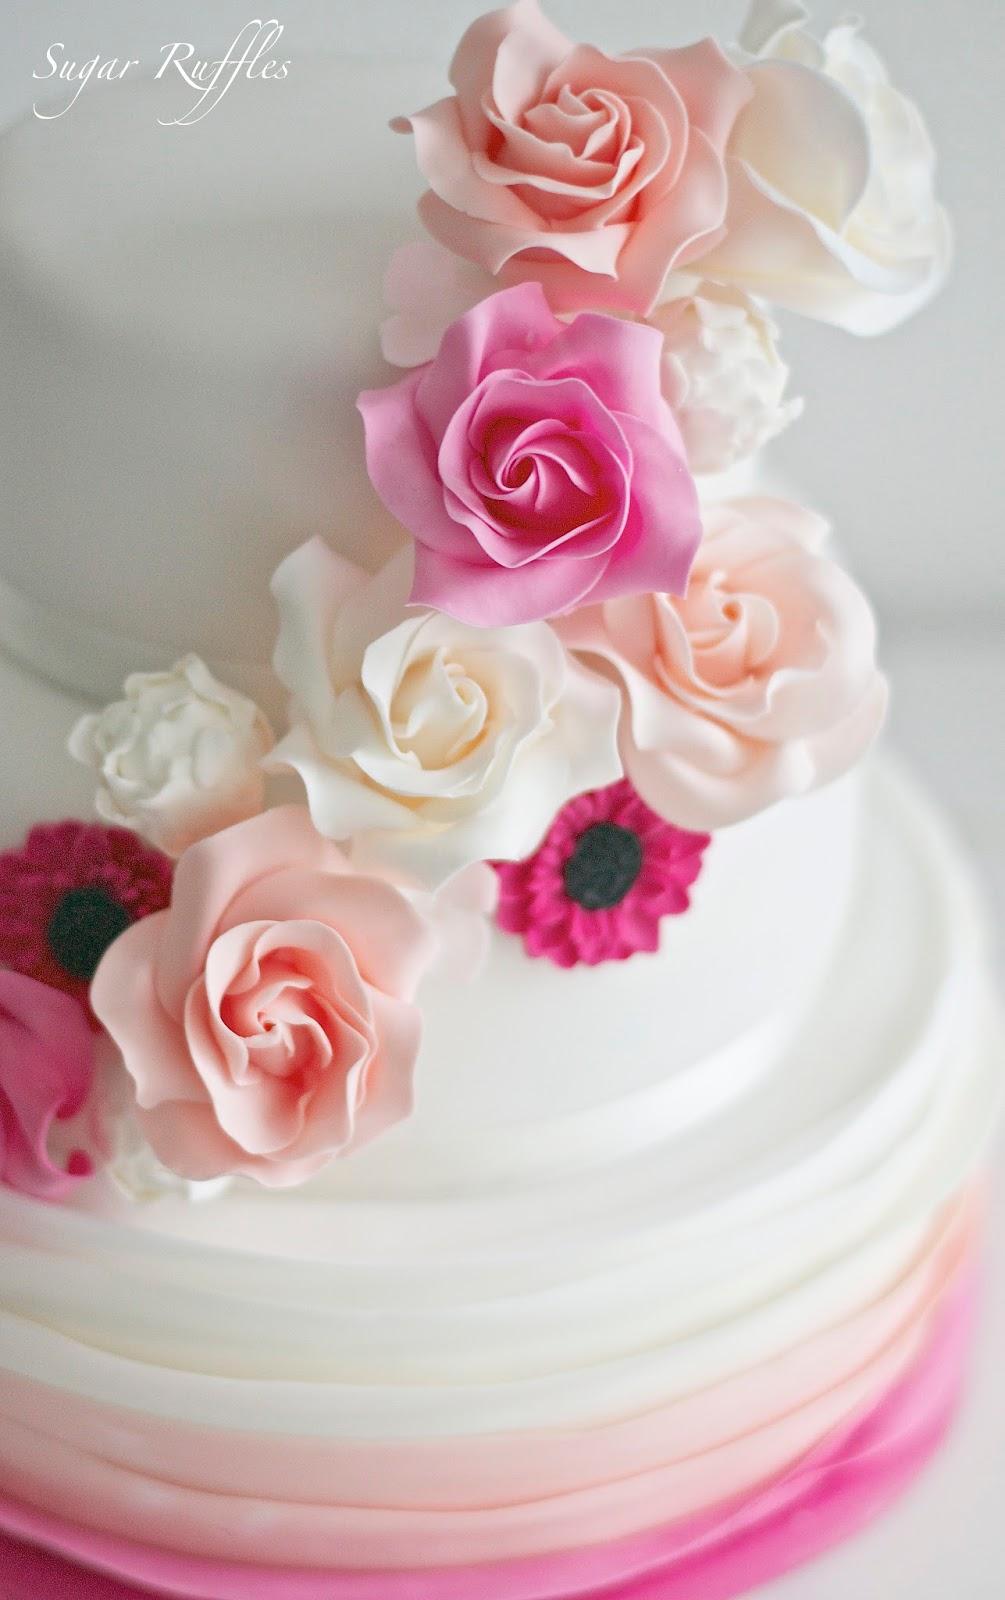 3 Tier Wedding Cakes 95 Stunning A tier wedding cake